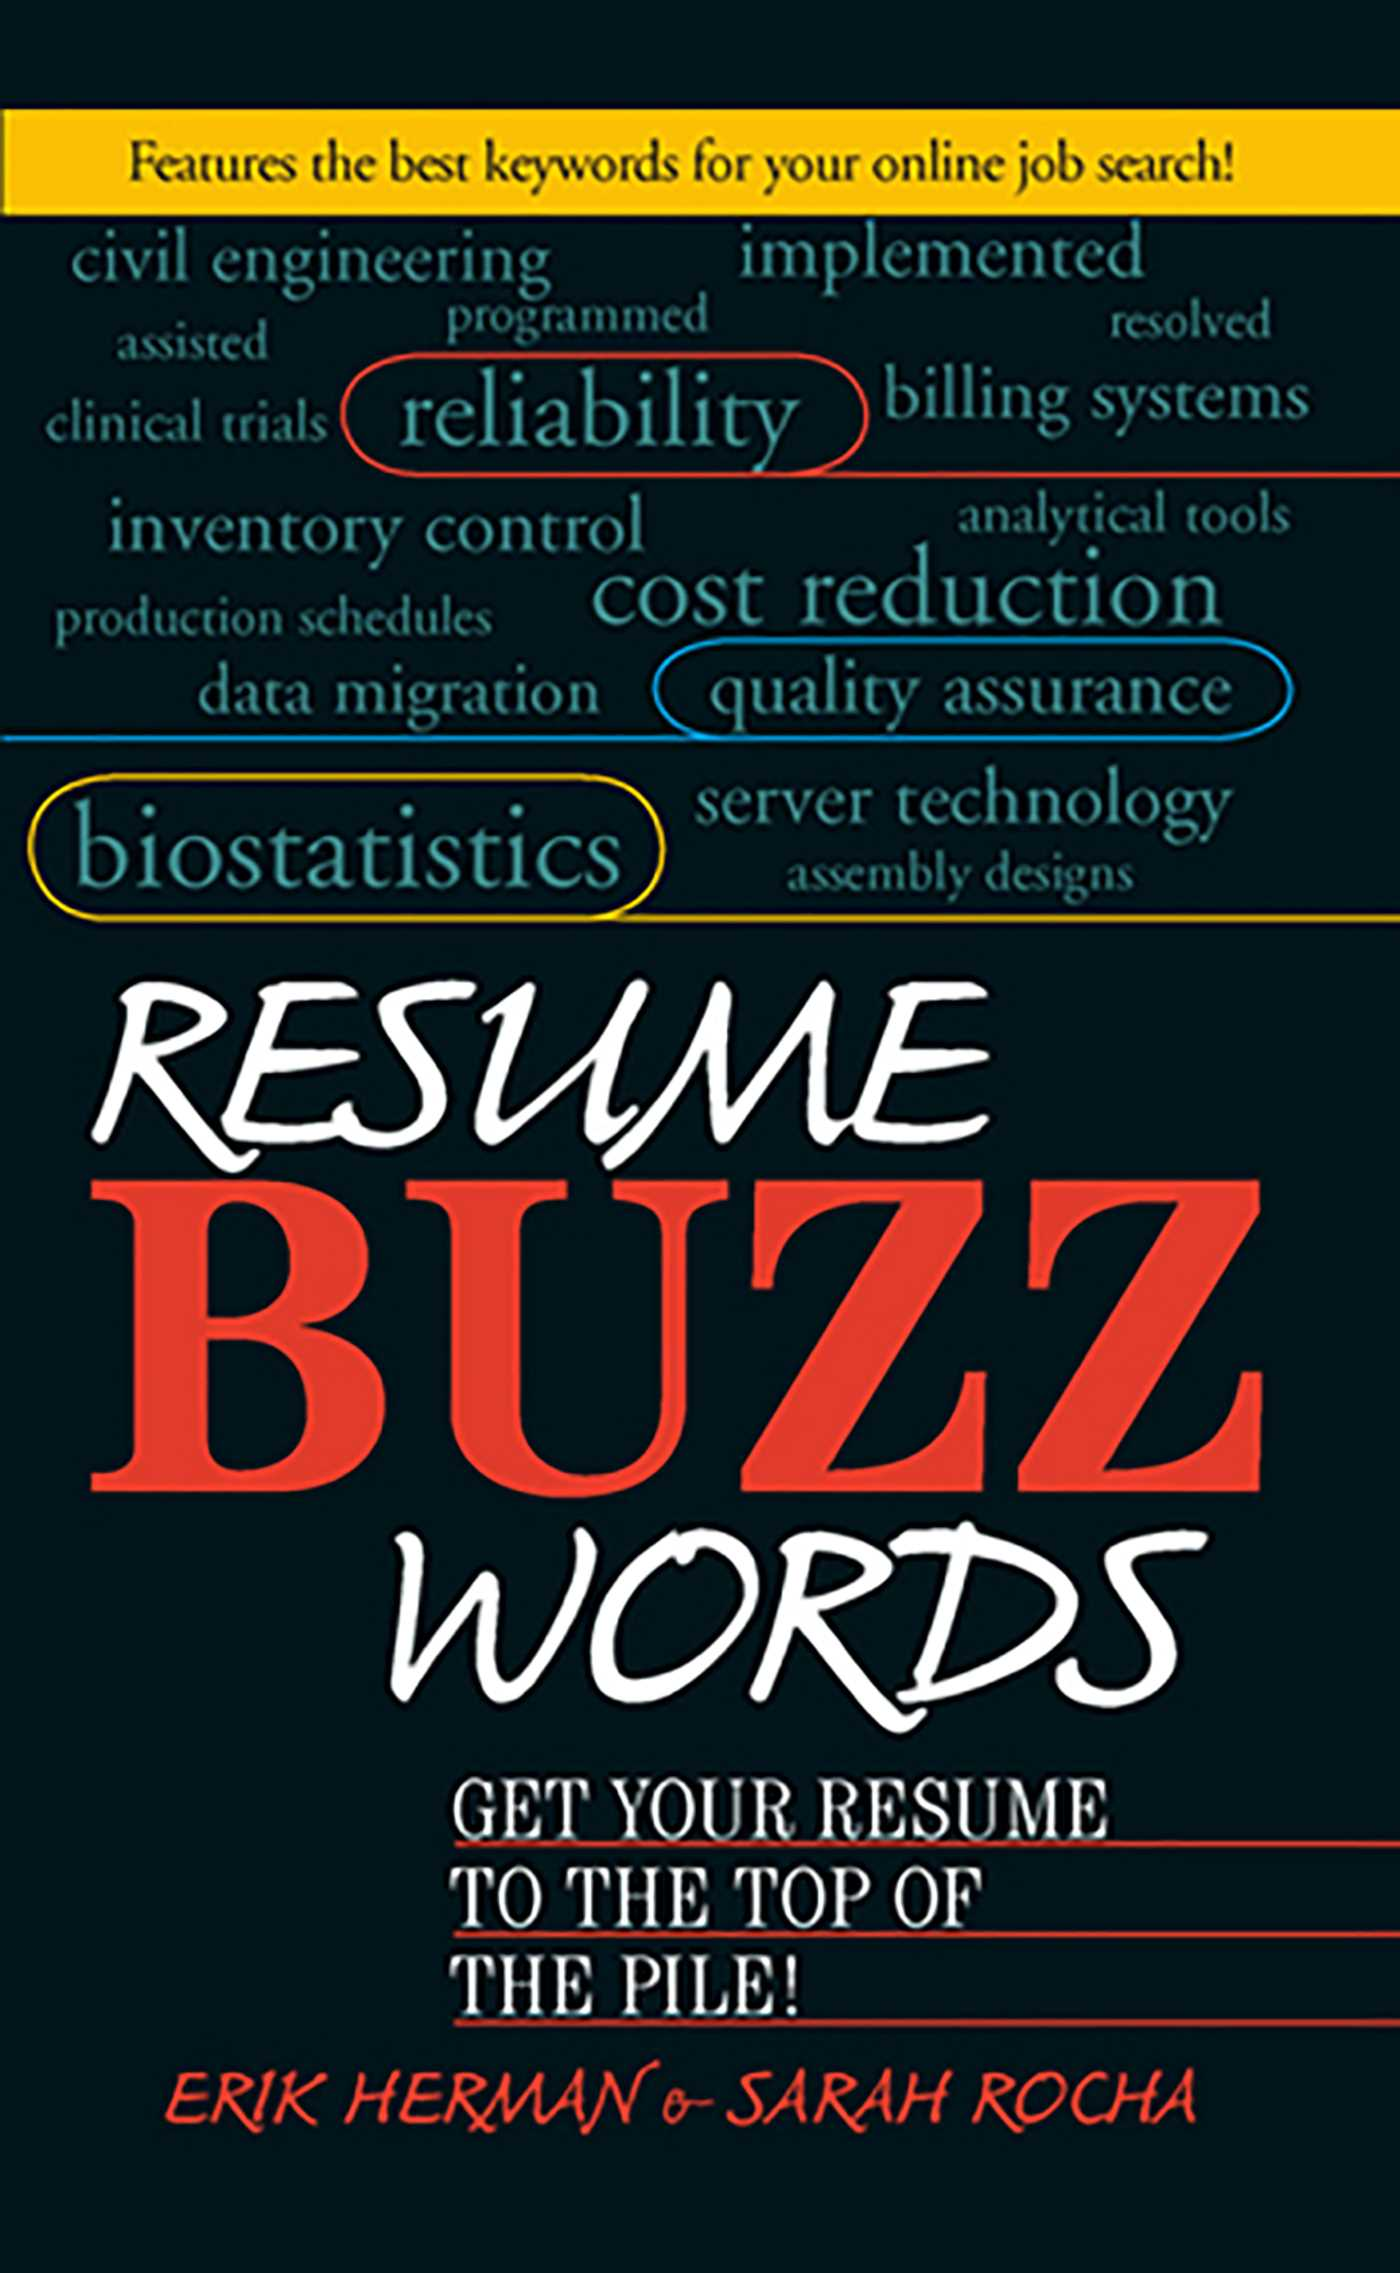 resume buzz words ebook by erik herman sarah rocha official